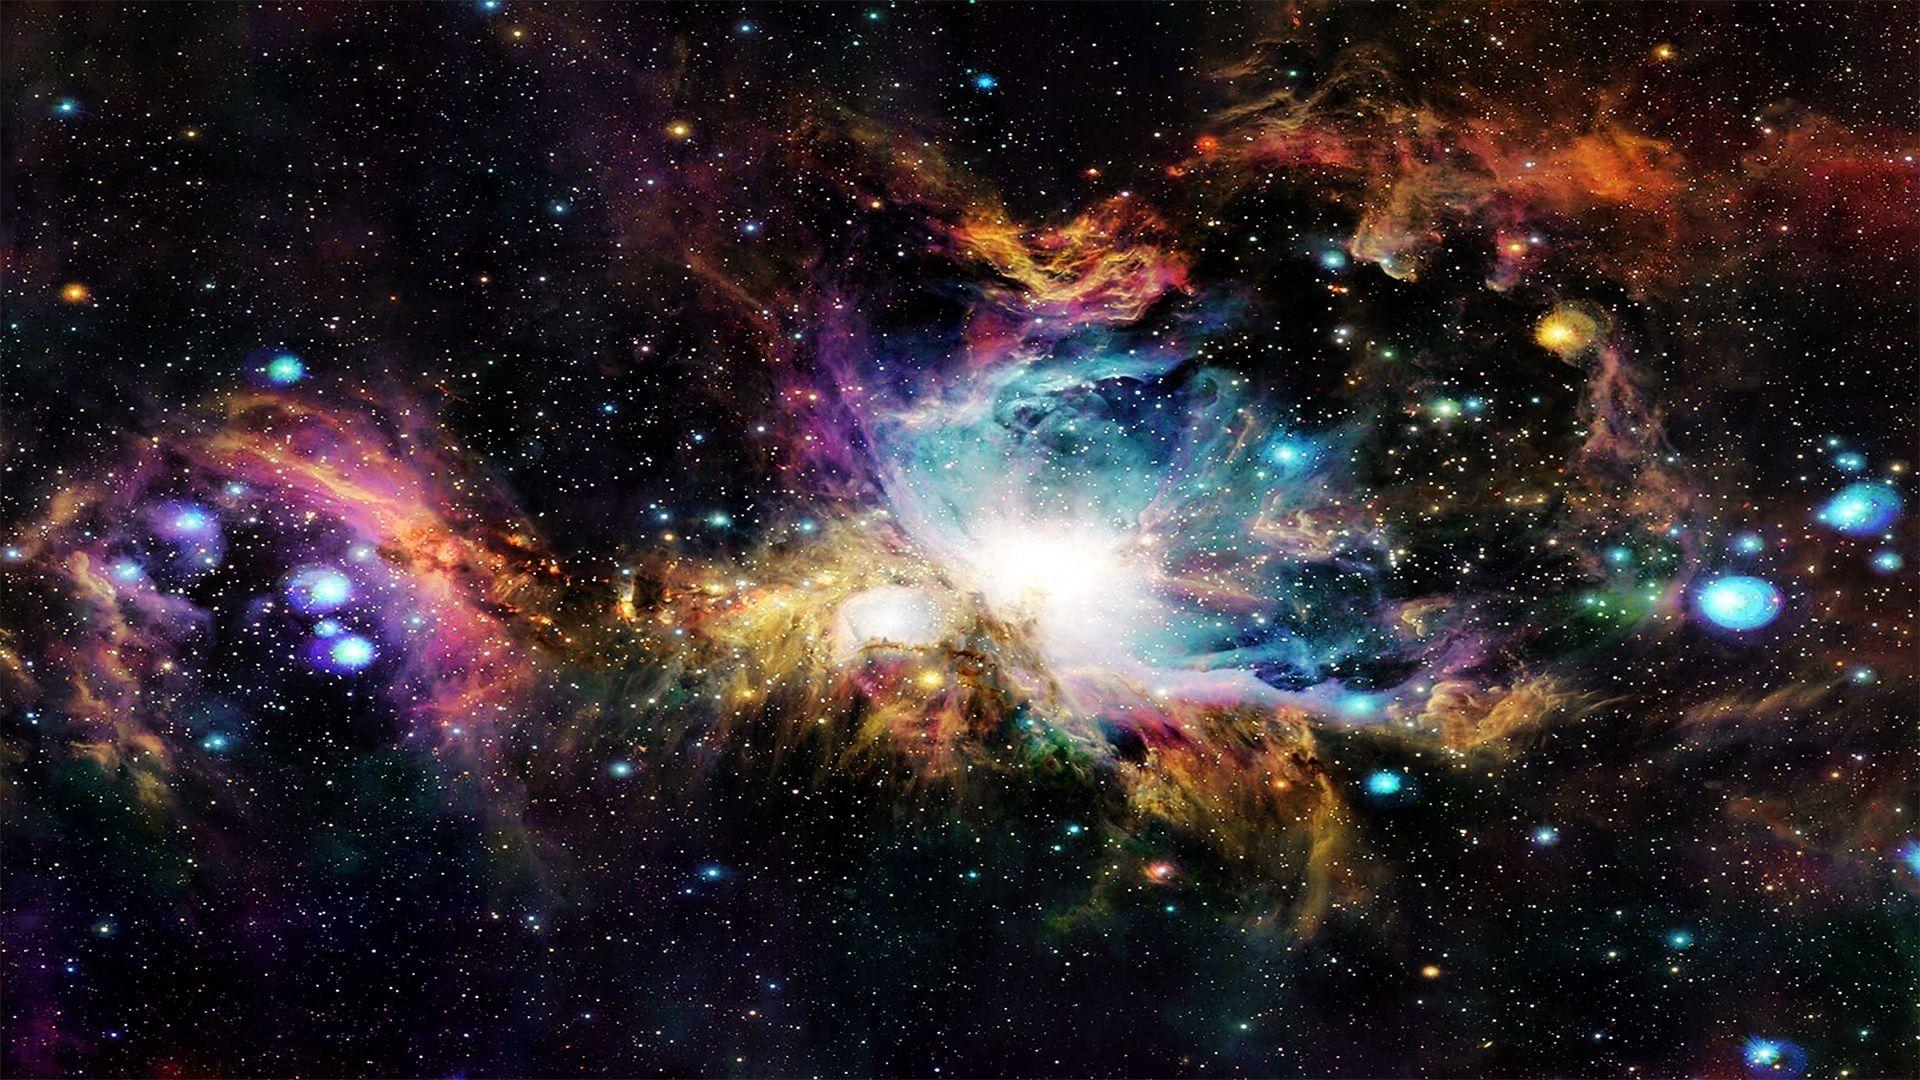 10 Best Nebula Desktop Backgrounds Hd Full Hd 1080p For Pc Desktop Nebula Wallpaper Nebula Orion Nebula Hd wallpaper stars space light nebula